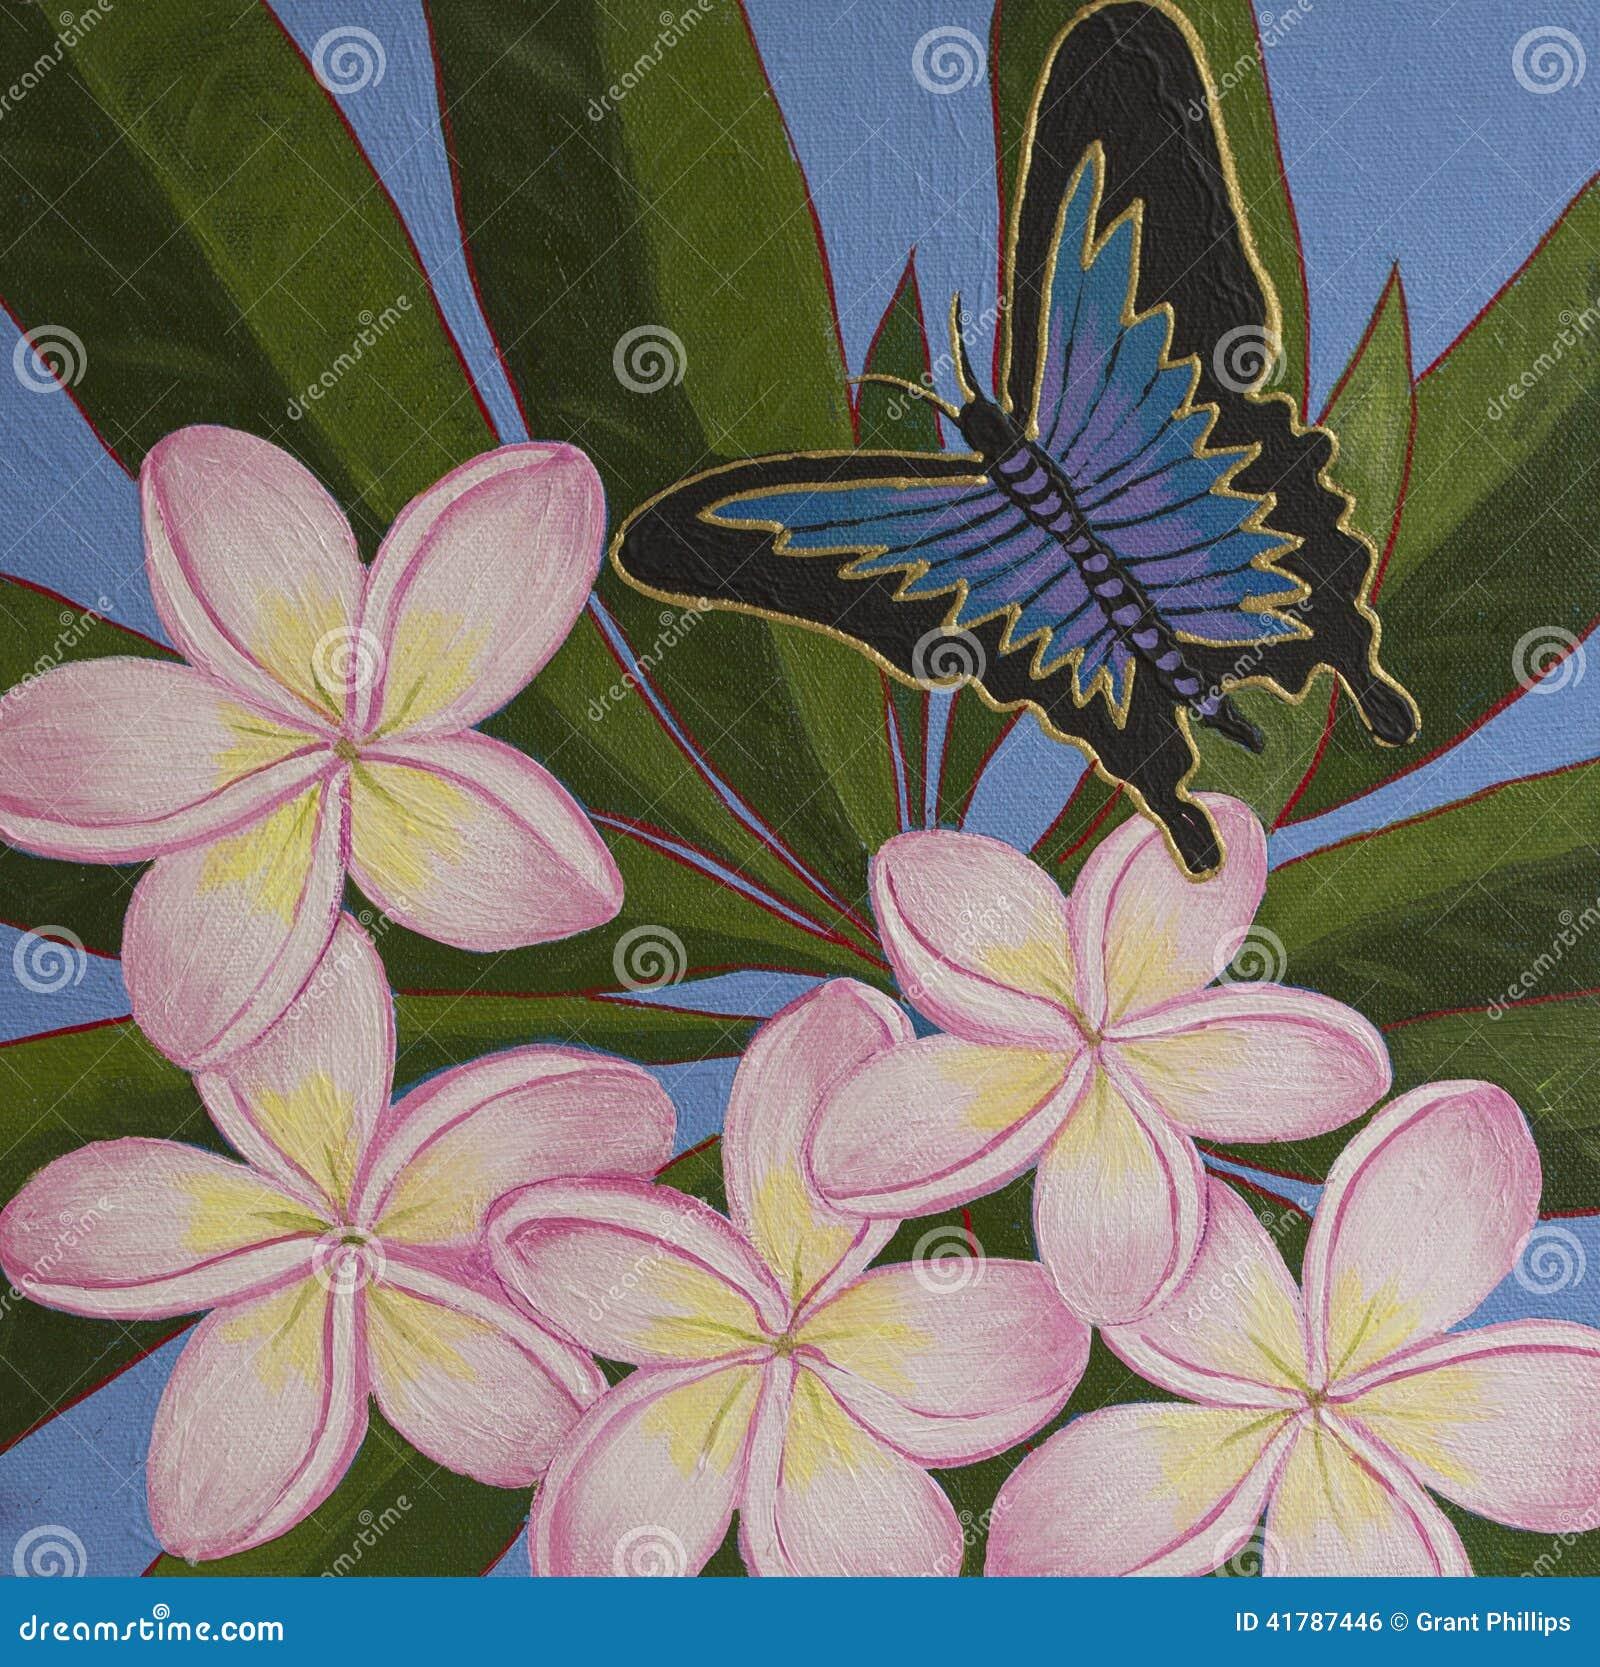 Pintura acrílica original - Ulysses Butterfly & Frangipani